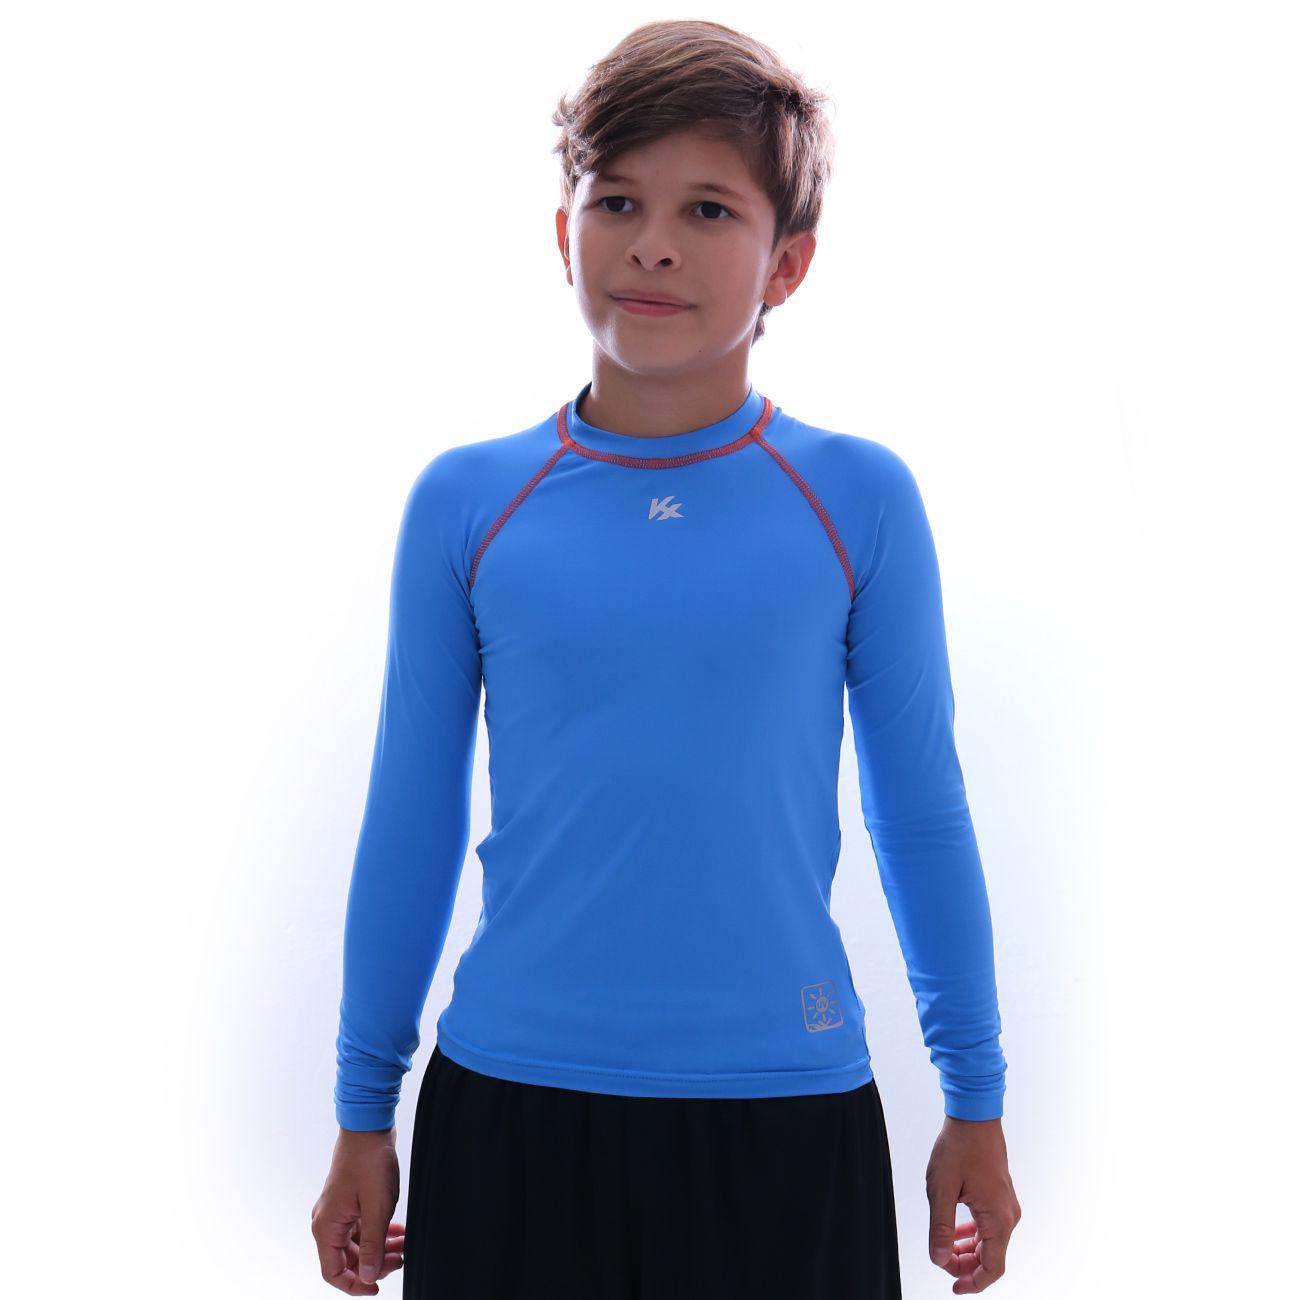 Camiseta Kanxa Protection M/l Infantil Azul